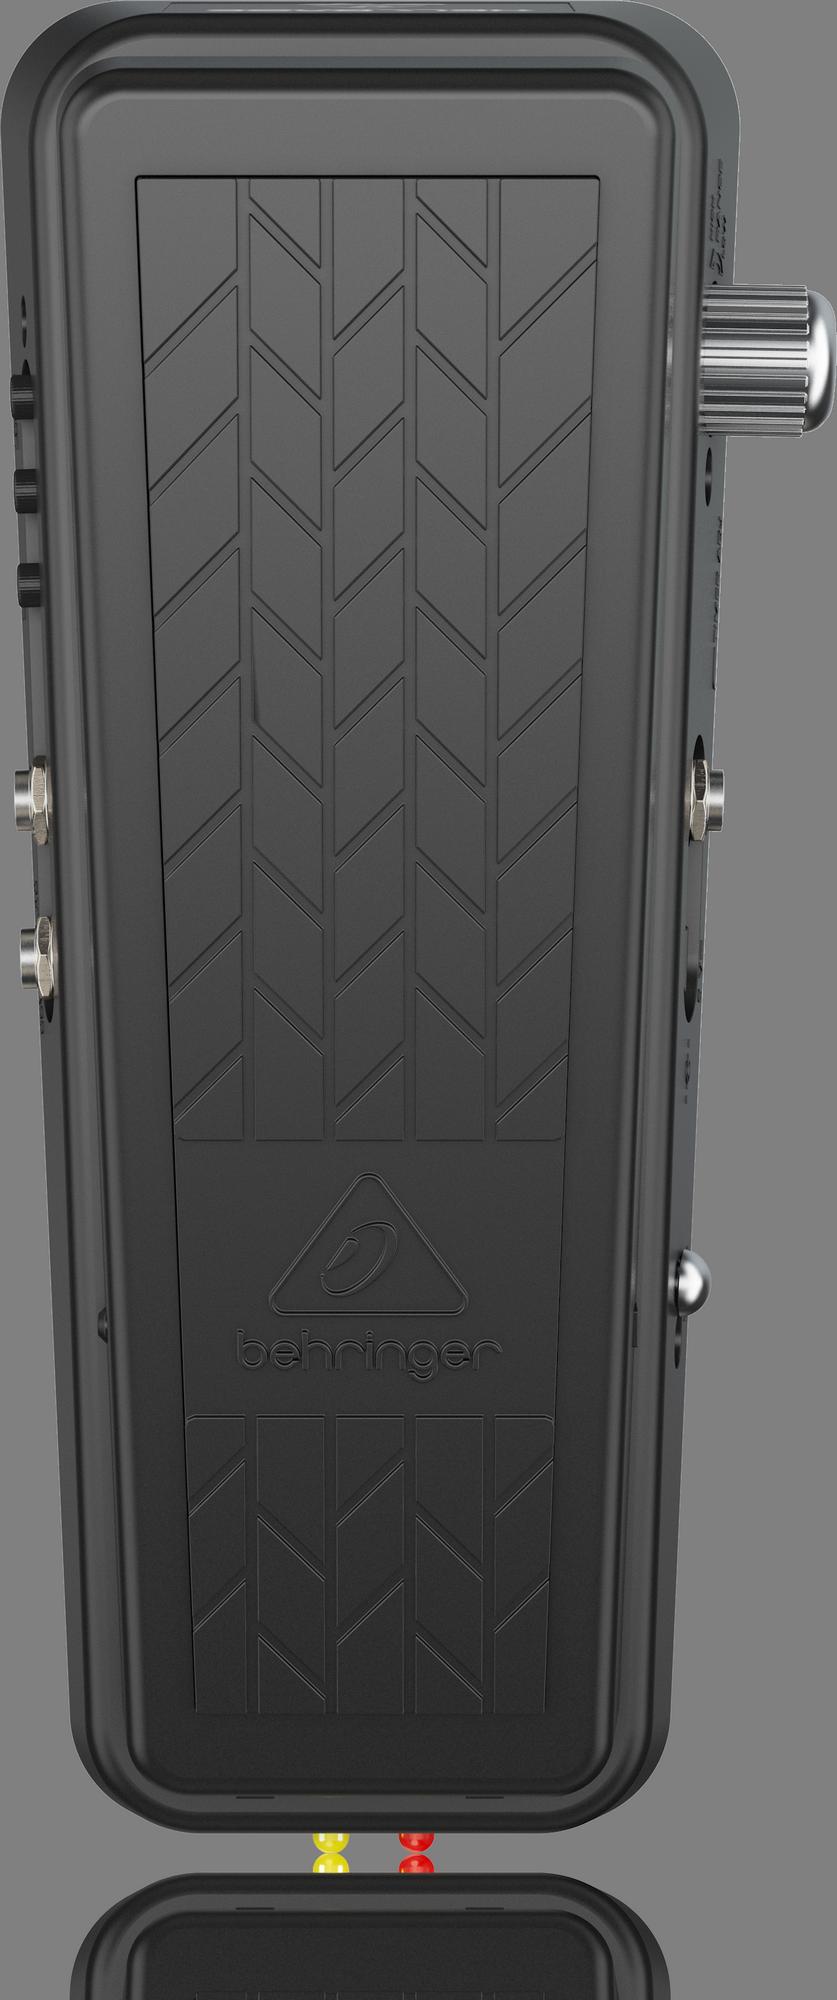 Behringer HellBabe HB01 - Wah-Wah Pedal